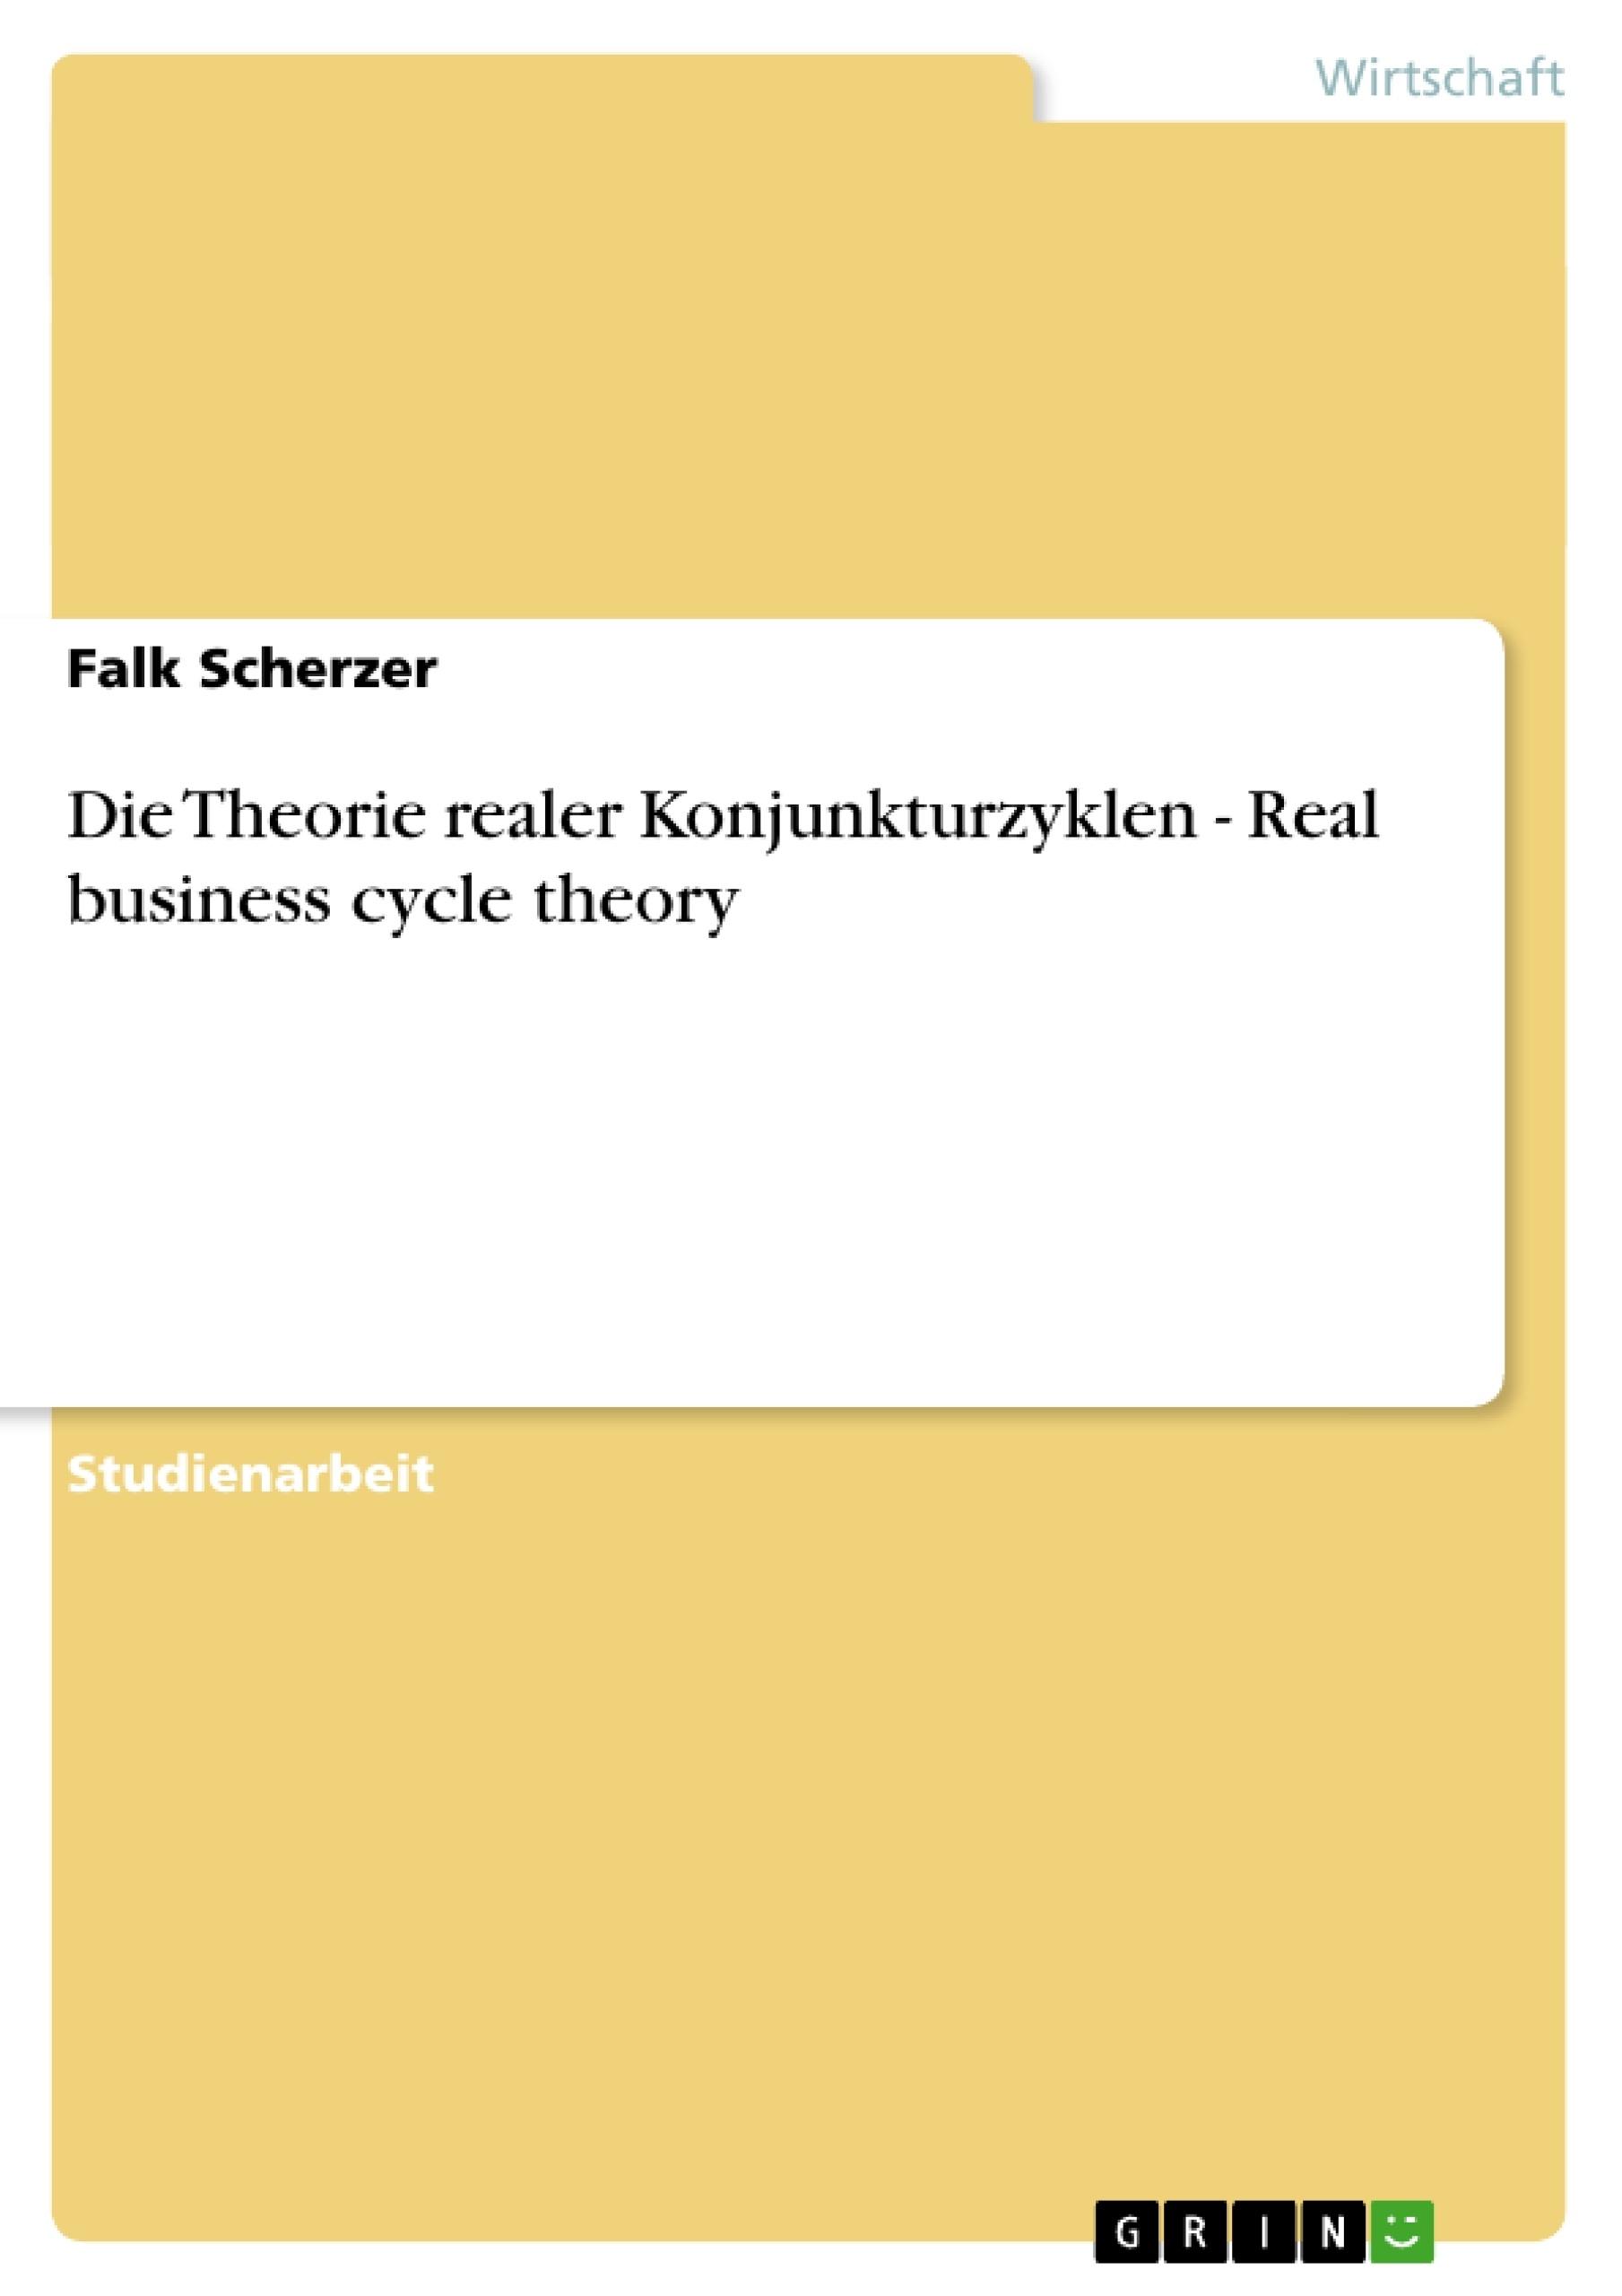 Titel: Die Theorie realer Konjunkturzyklen - Real business cycle theory